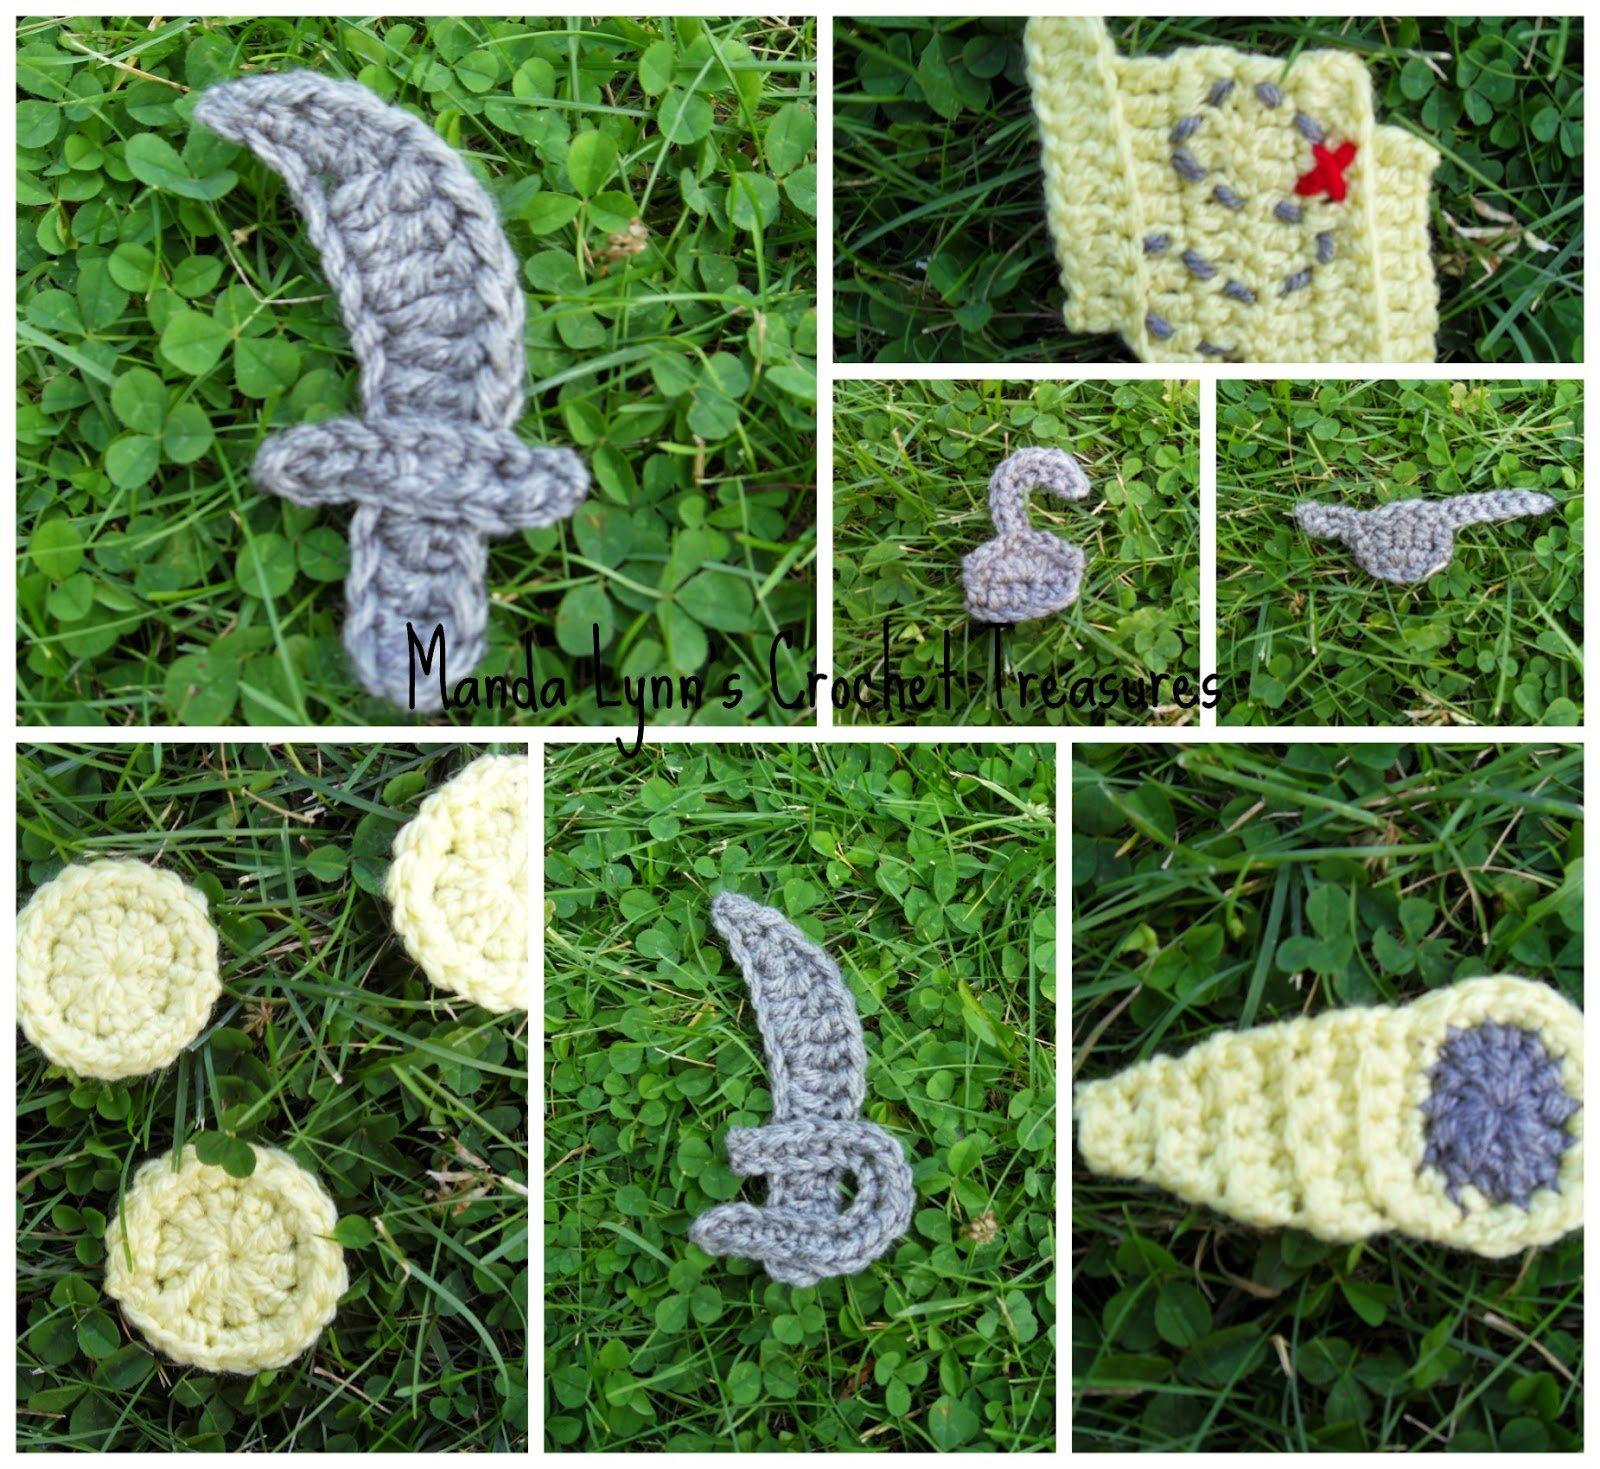 Pirate Applique Set ~ Manda Proell - MandaLynn's Crochet Treasures